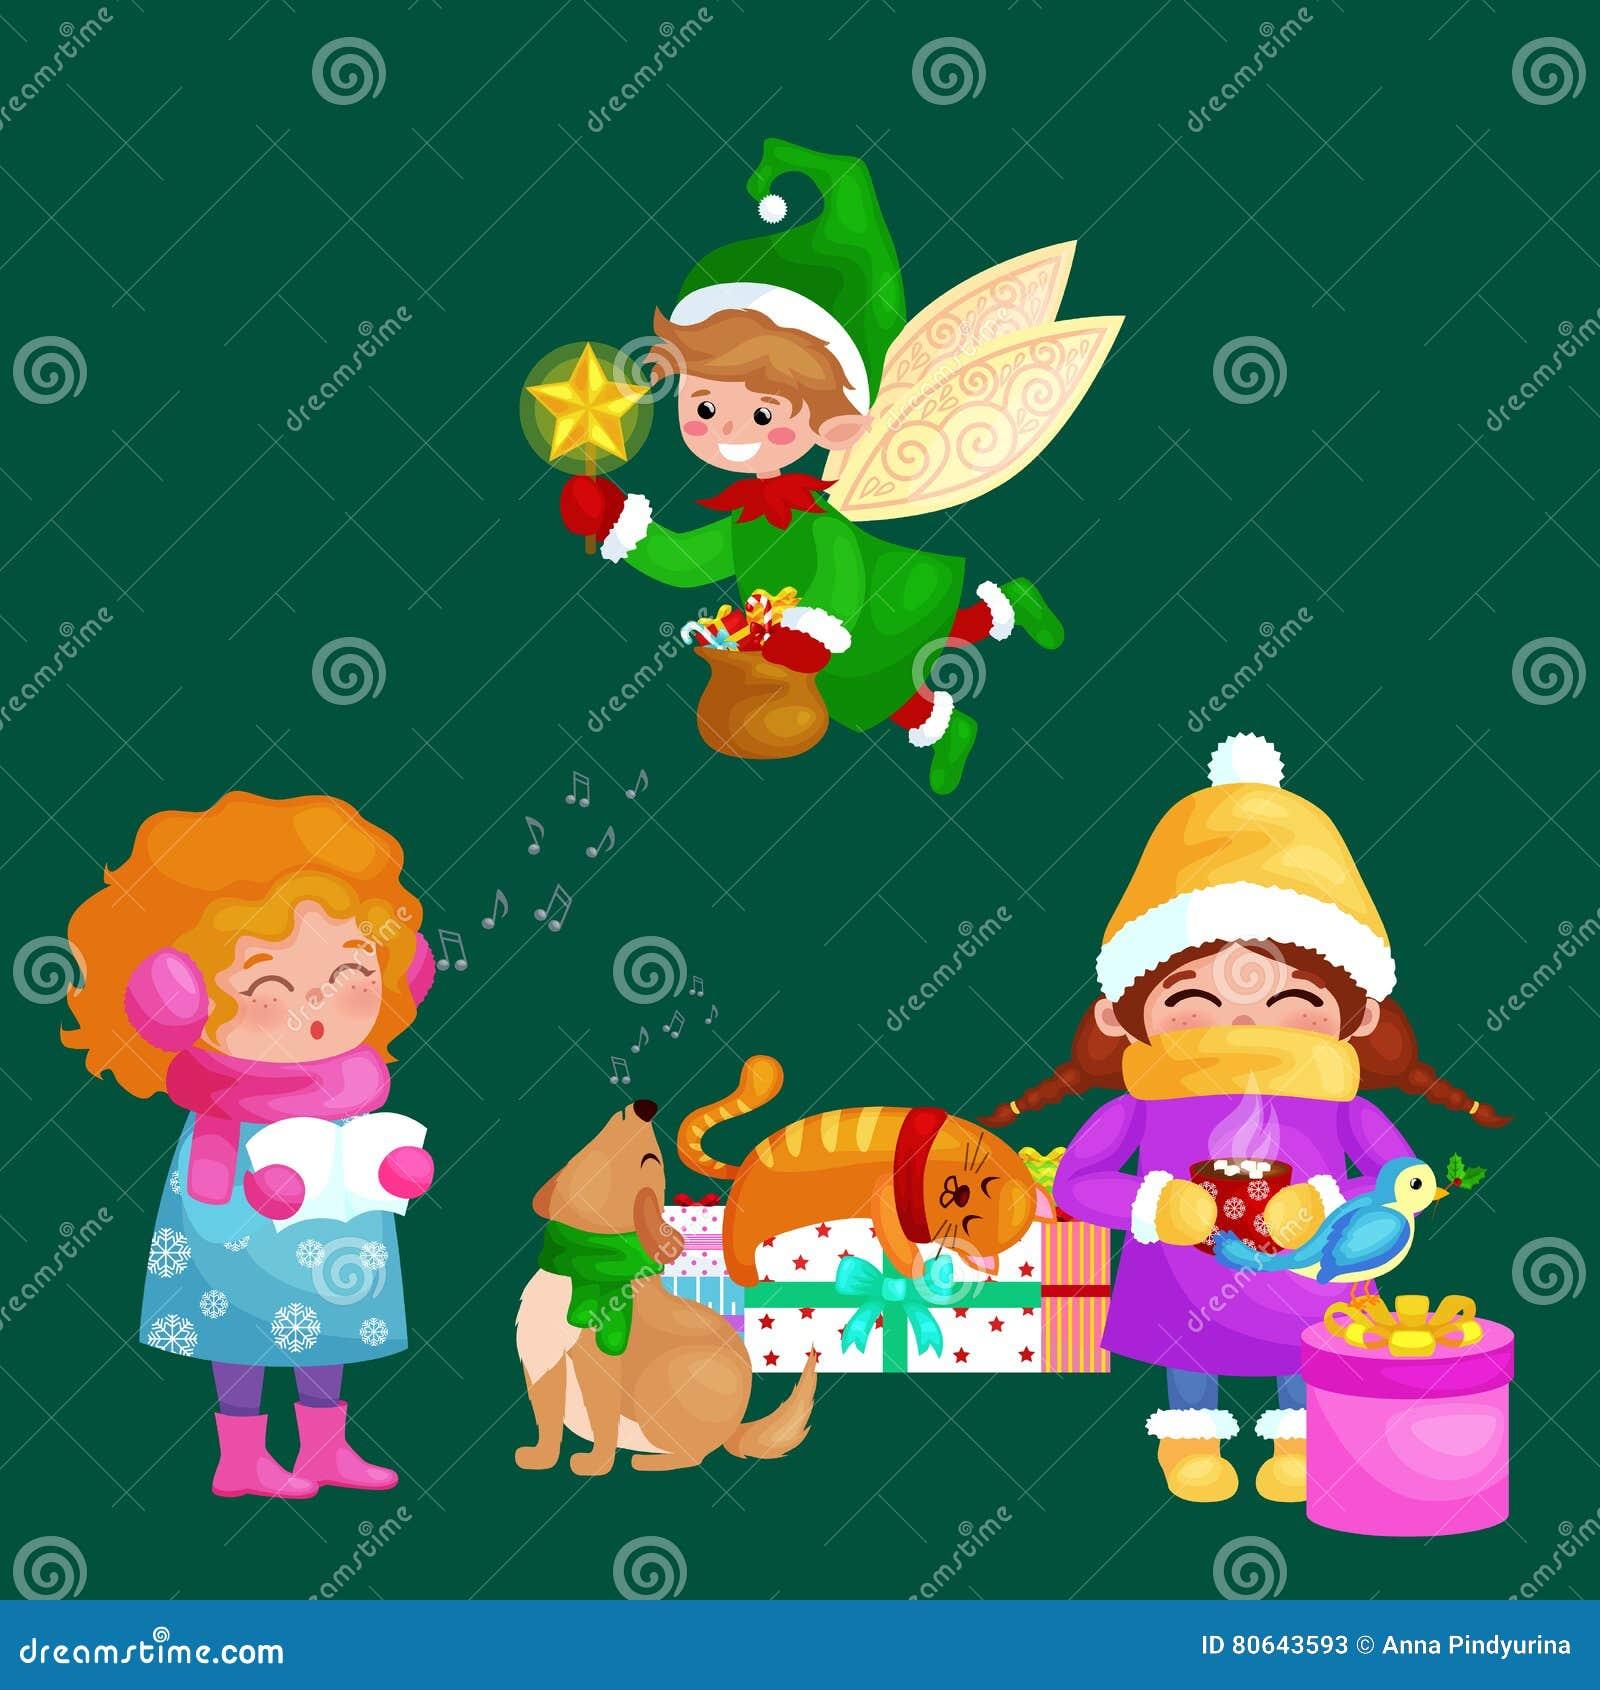 Chanson Joyeux Noel.Les Illustrations Reglees Bonne Annee De Joyeux Noel Fille